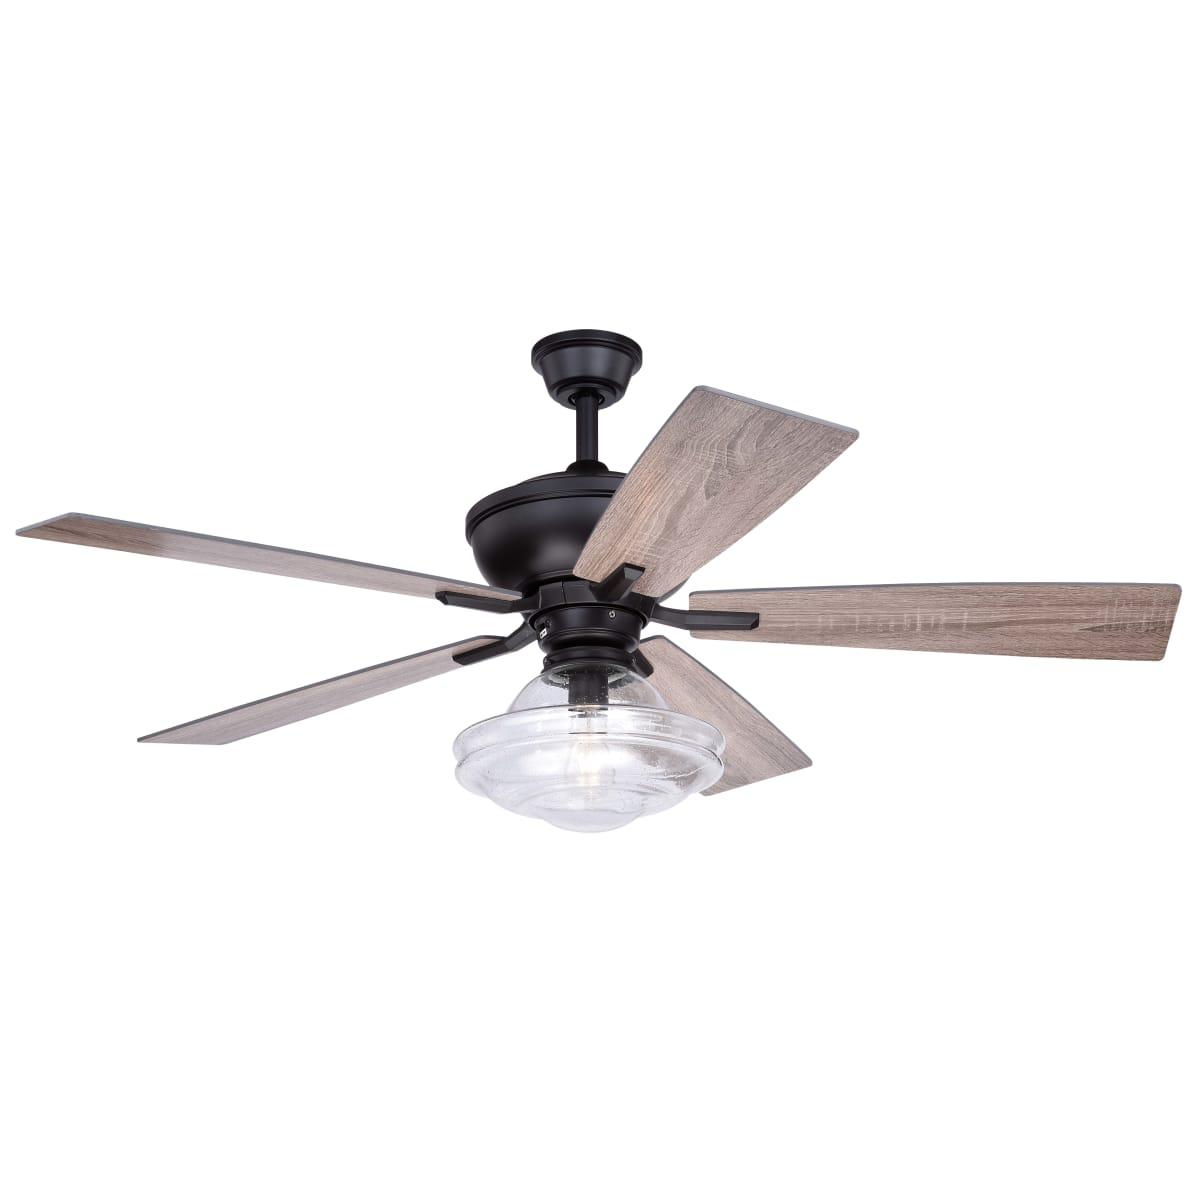 Bellevue Vxcfa43057brz Bronze Kash 52 5 Blade Ceiling Fan With A Glass Shade Lightingshowplace Com